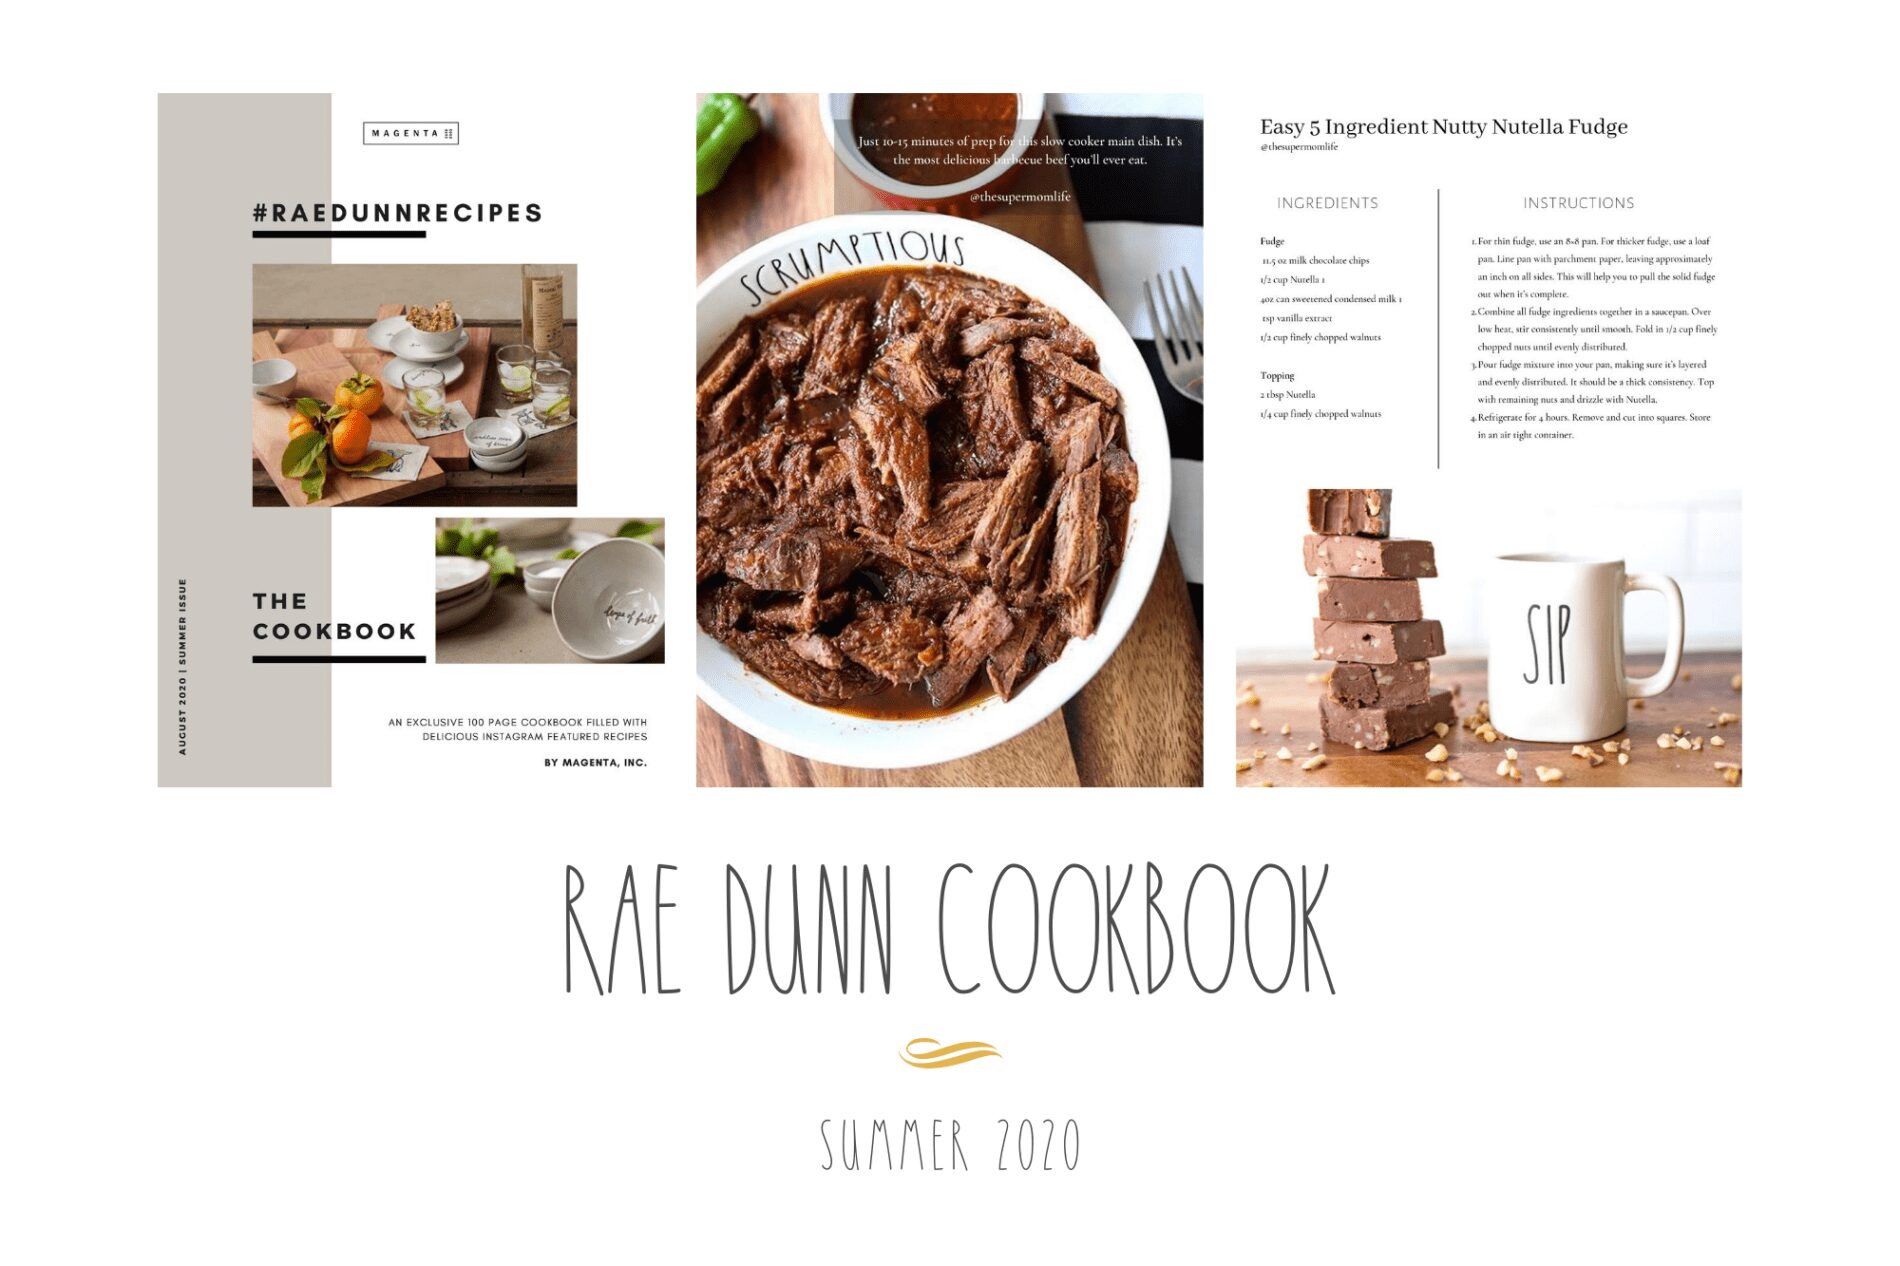 Rae Dunn cookbook summer 2020